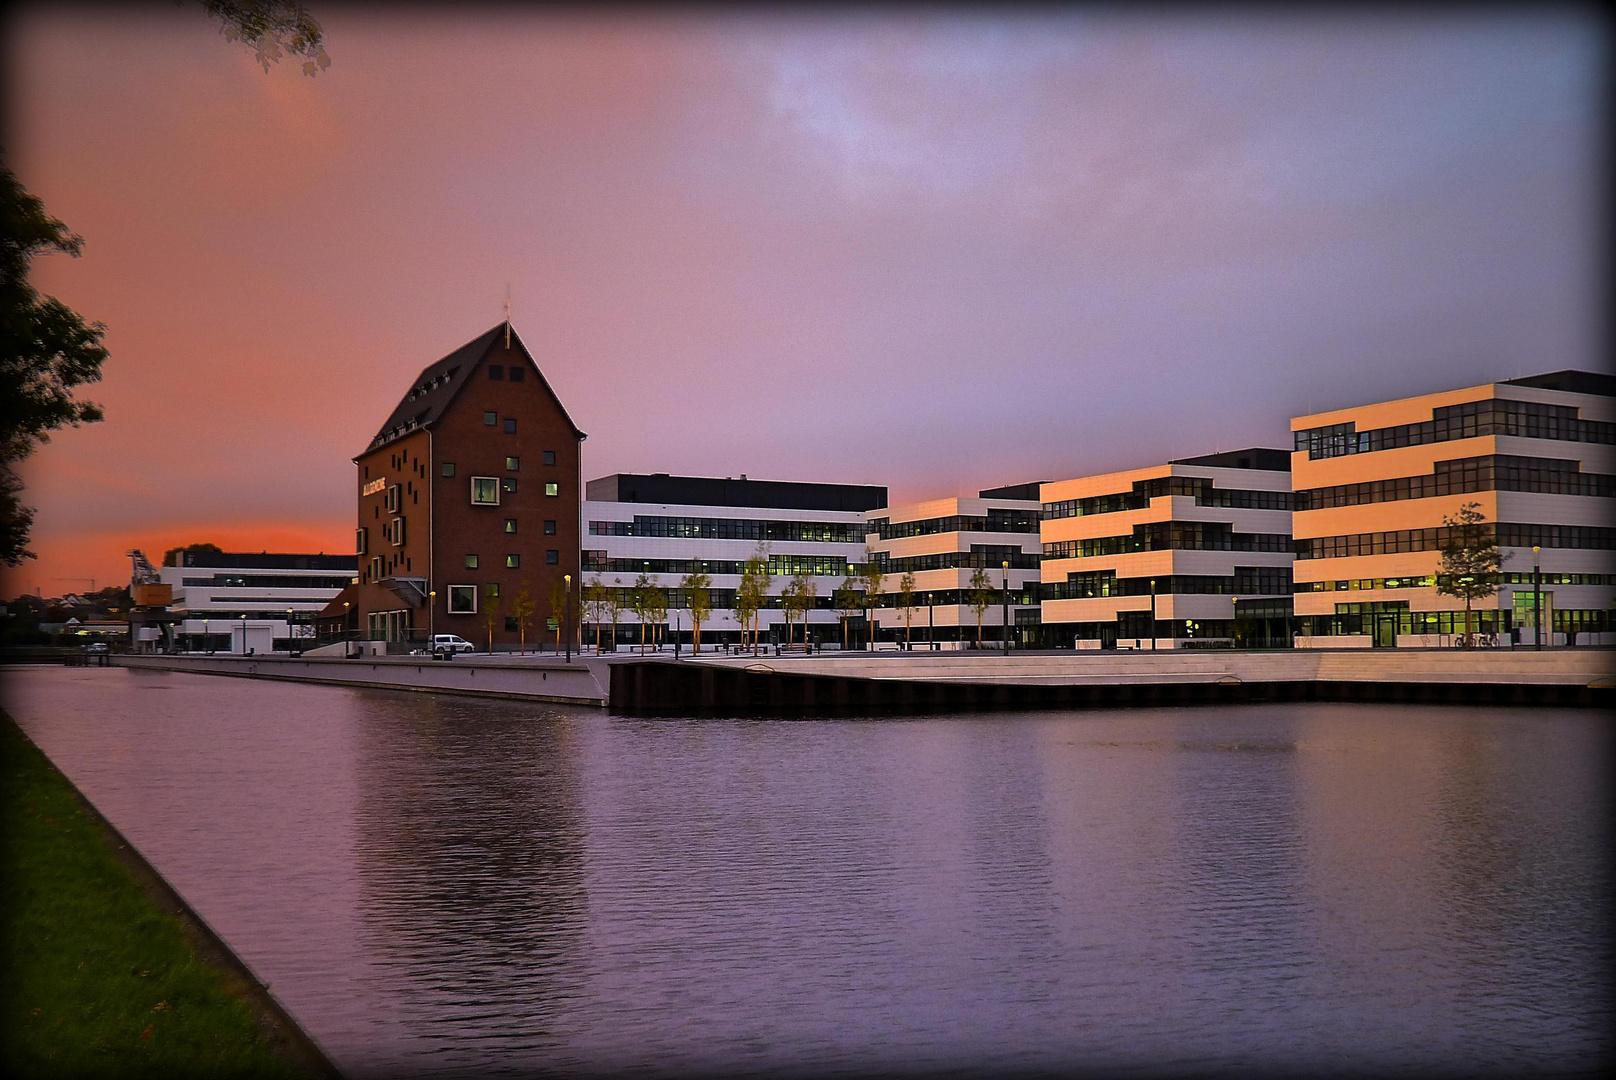 Rhine-Waal University of Applied Sciences at 7:00